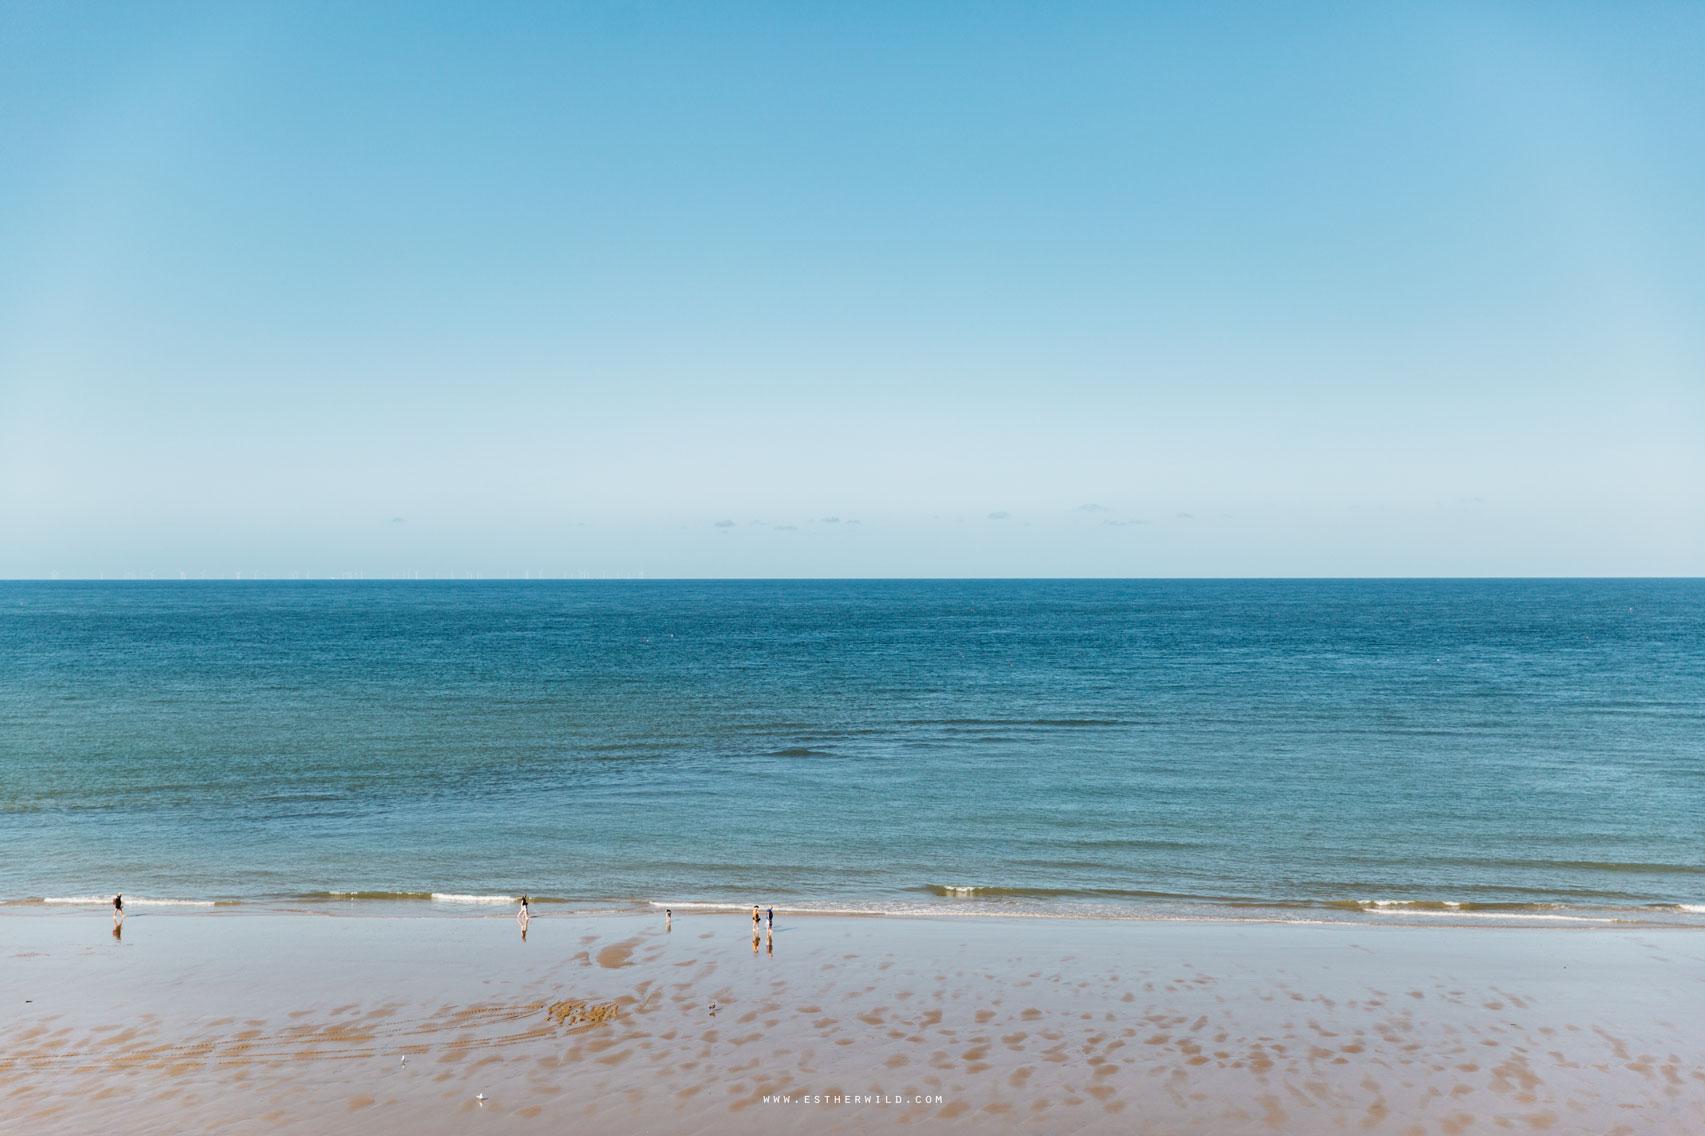 Cromer_Wedding_Beach_Outdoor_Ceremony_Norfolk_North_Lodge_Registry_Office_Rocket_House_Cafe_Cromer_Pier_IMG_3602_IMGL7824.jpg